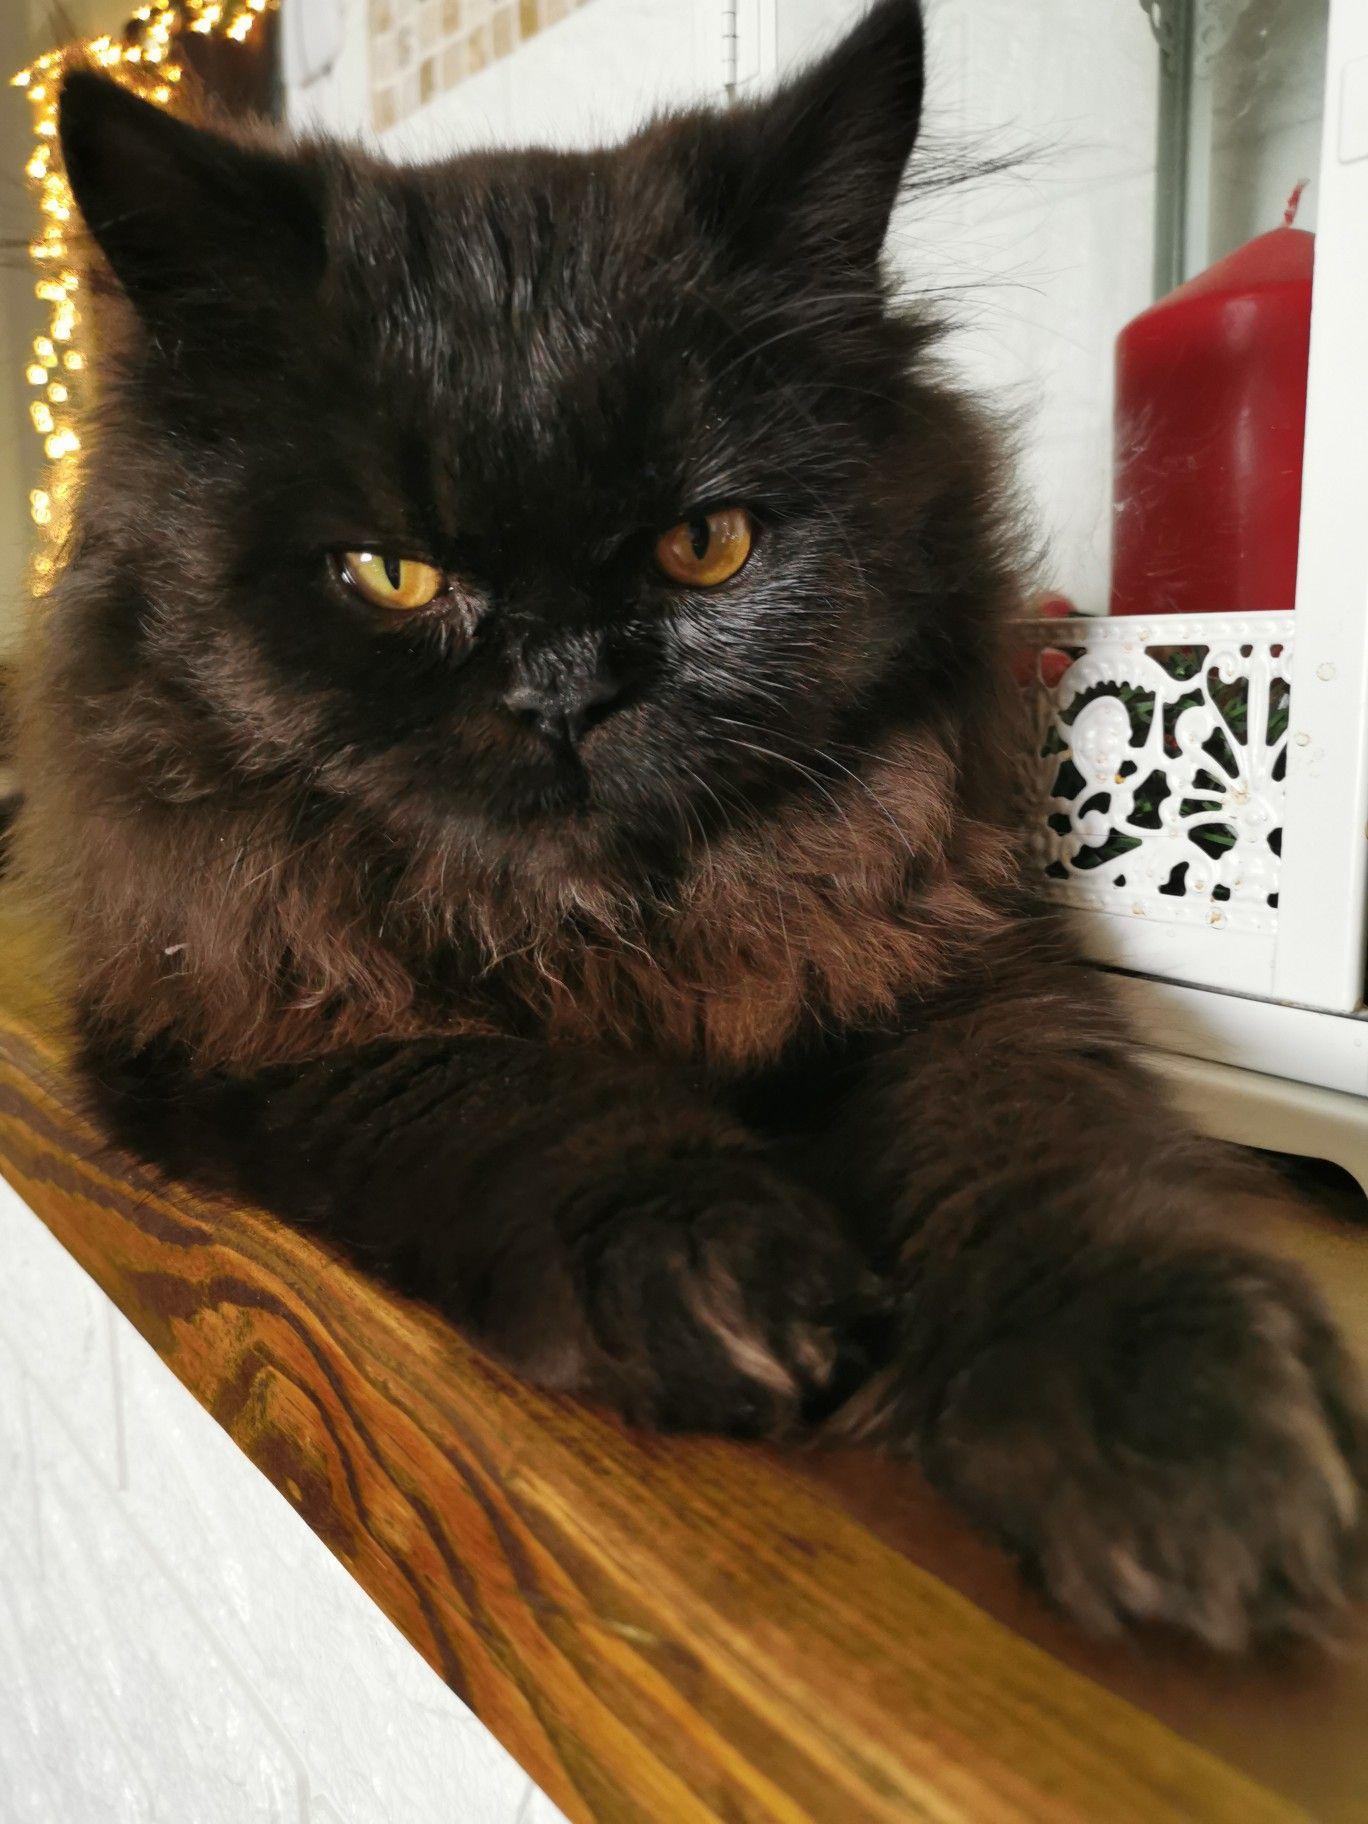 #rengartheinstacat #rengar #kittens #gatitos #persiancat #persiancatstagram #persiancats #persiancatlovers #gatospersas #gatospersa #gatos #gatosmonterrey #gatosmexico #persacat #gatosdeinstagram #catsofinstagram